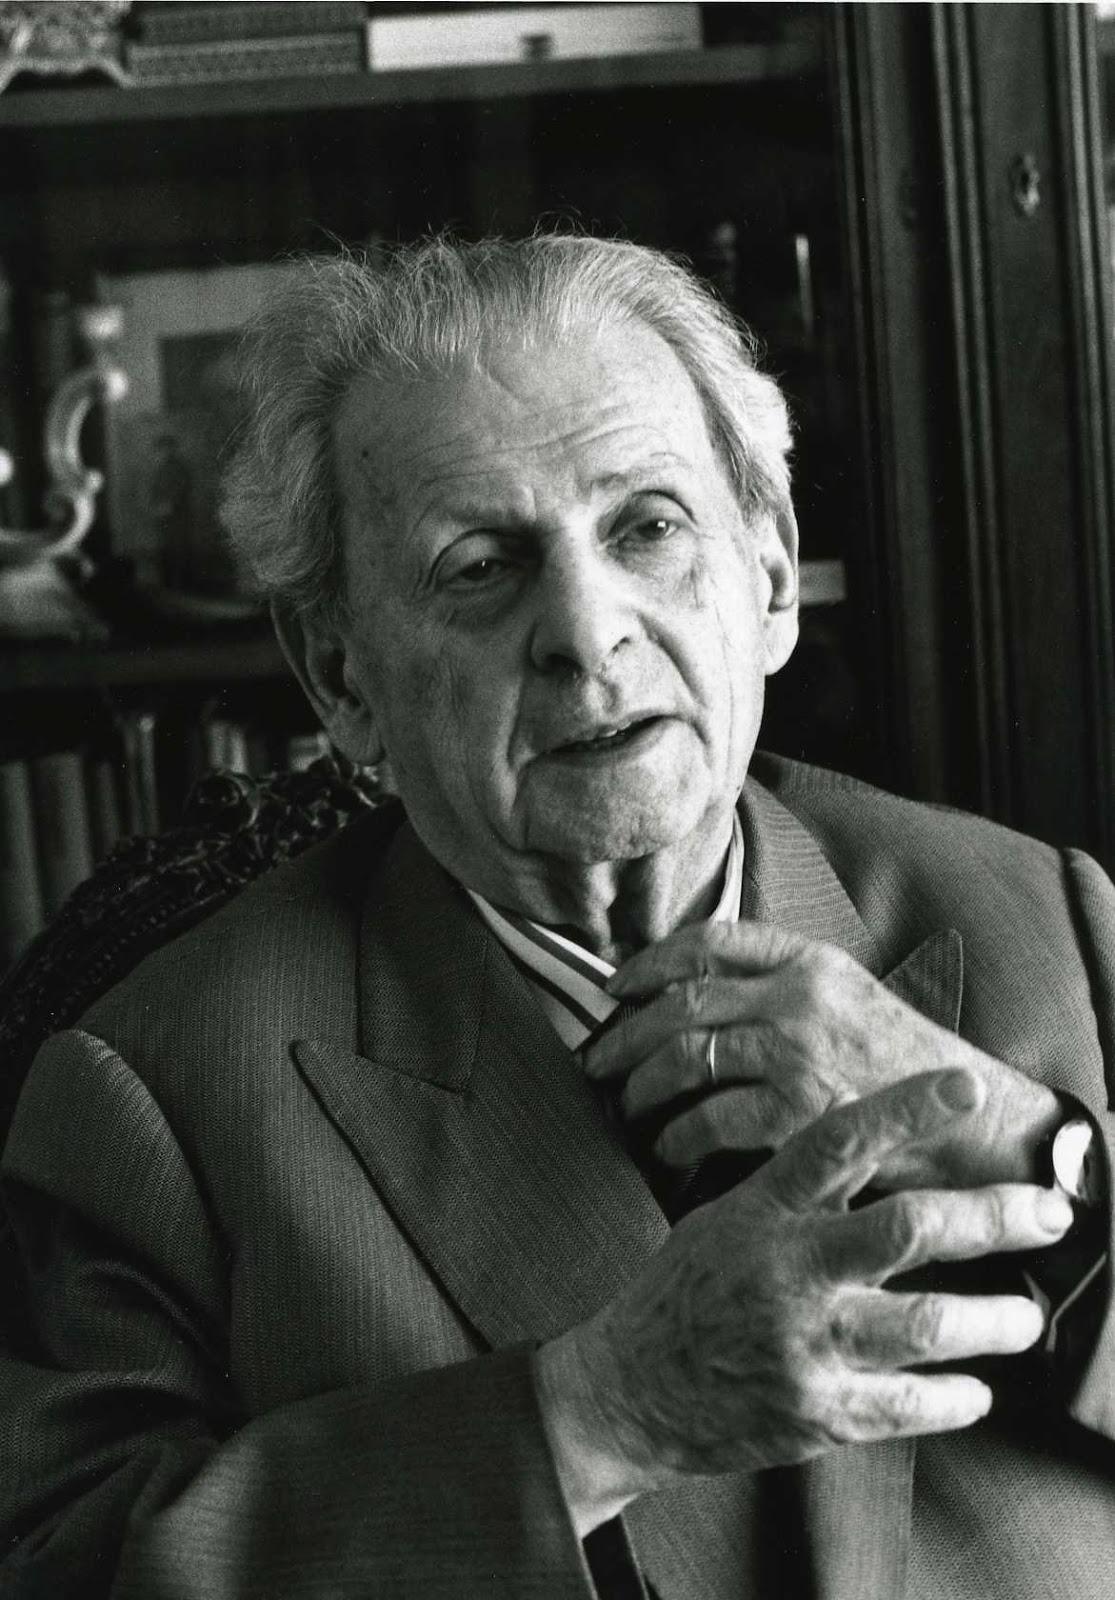 Filósofo judío, discípulo de Heidegger, responsabilidad